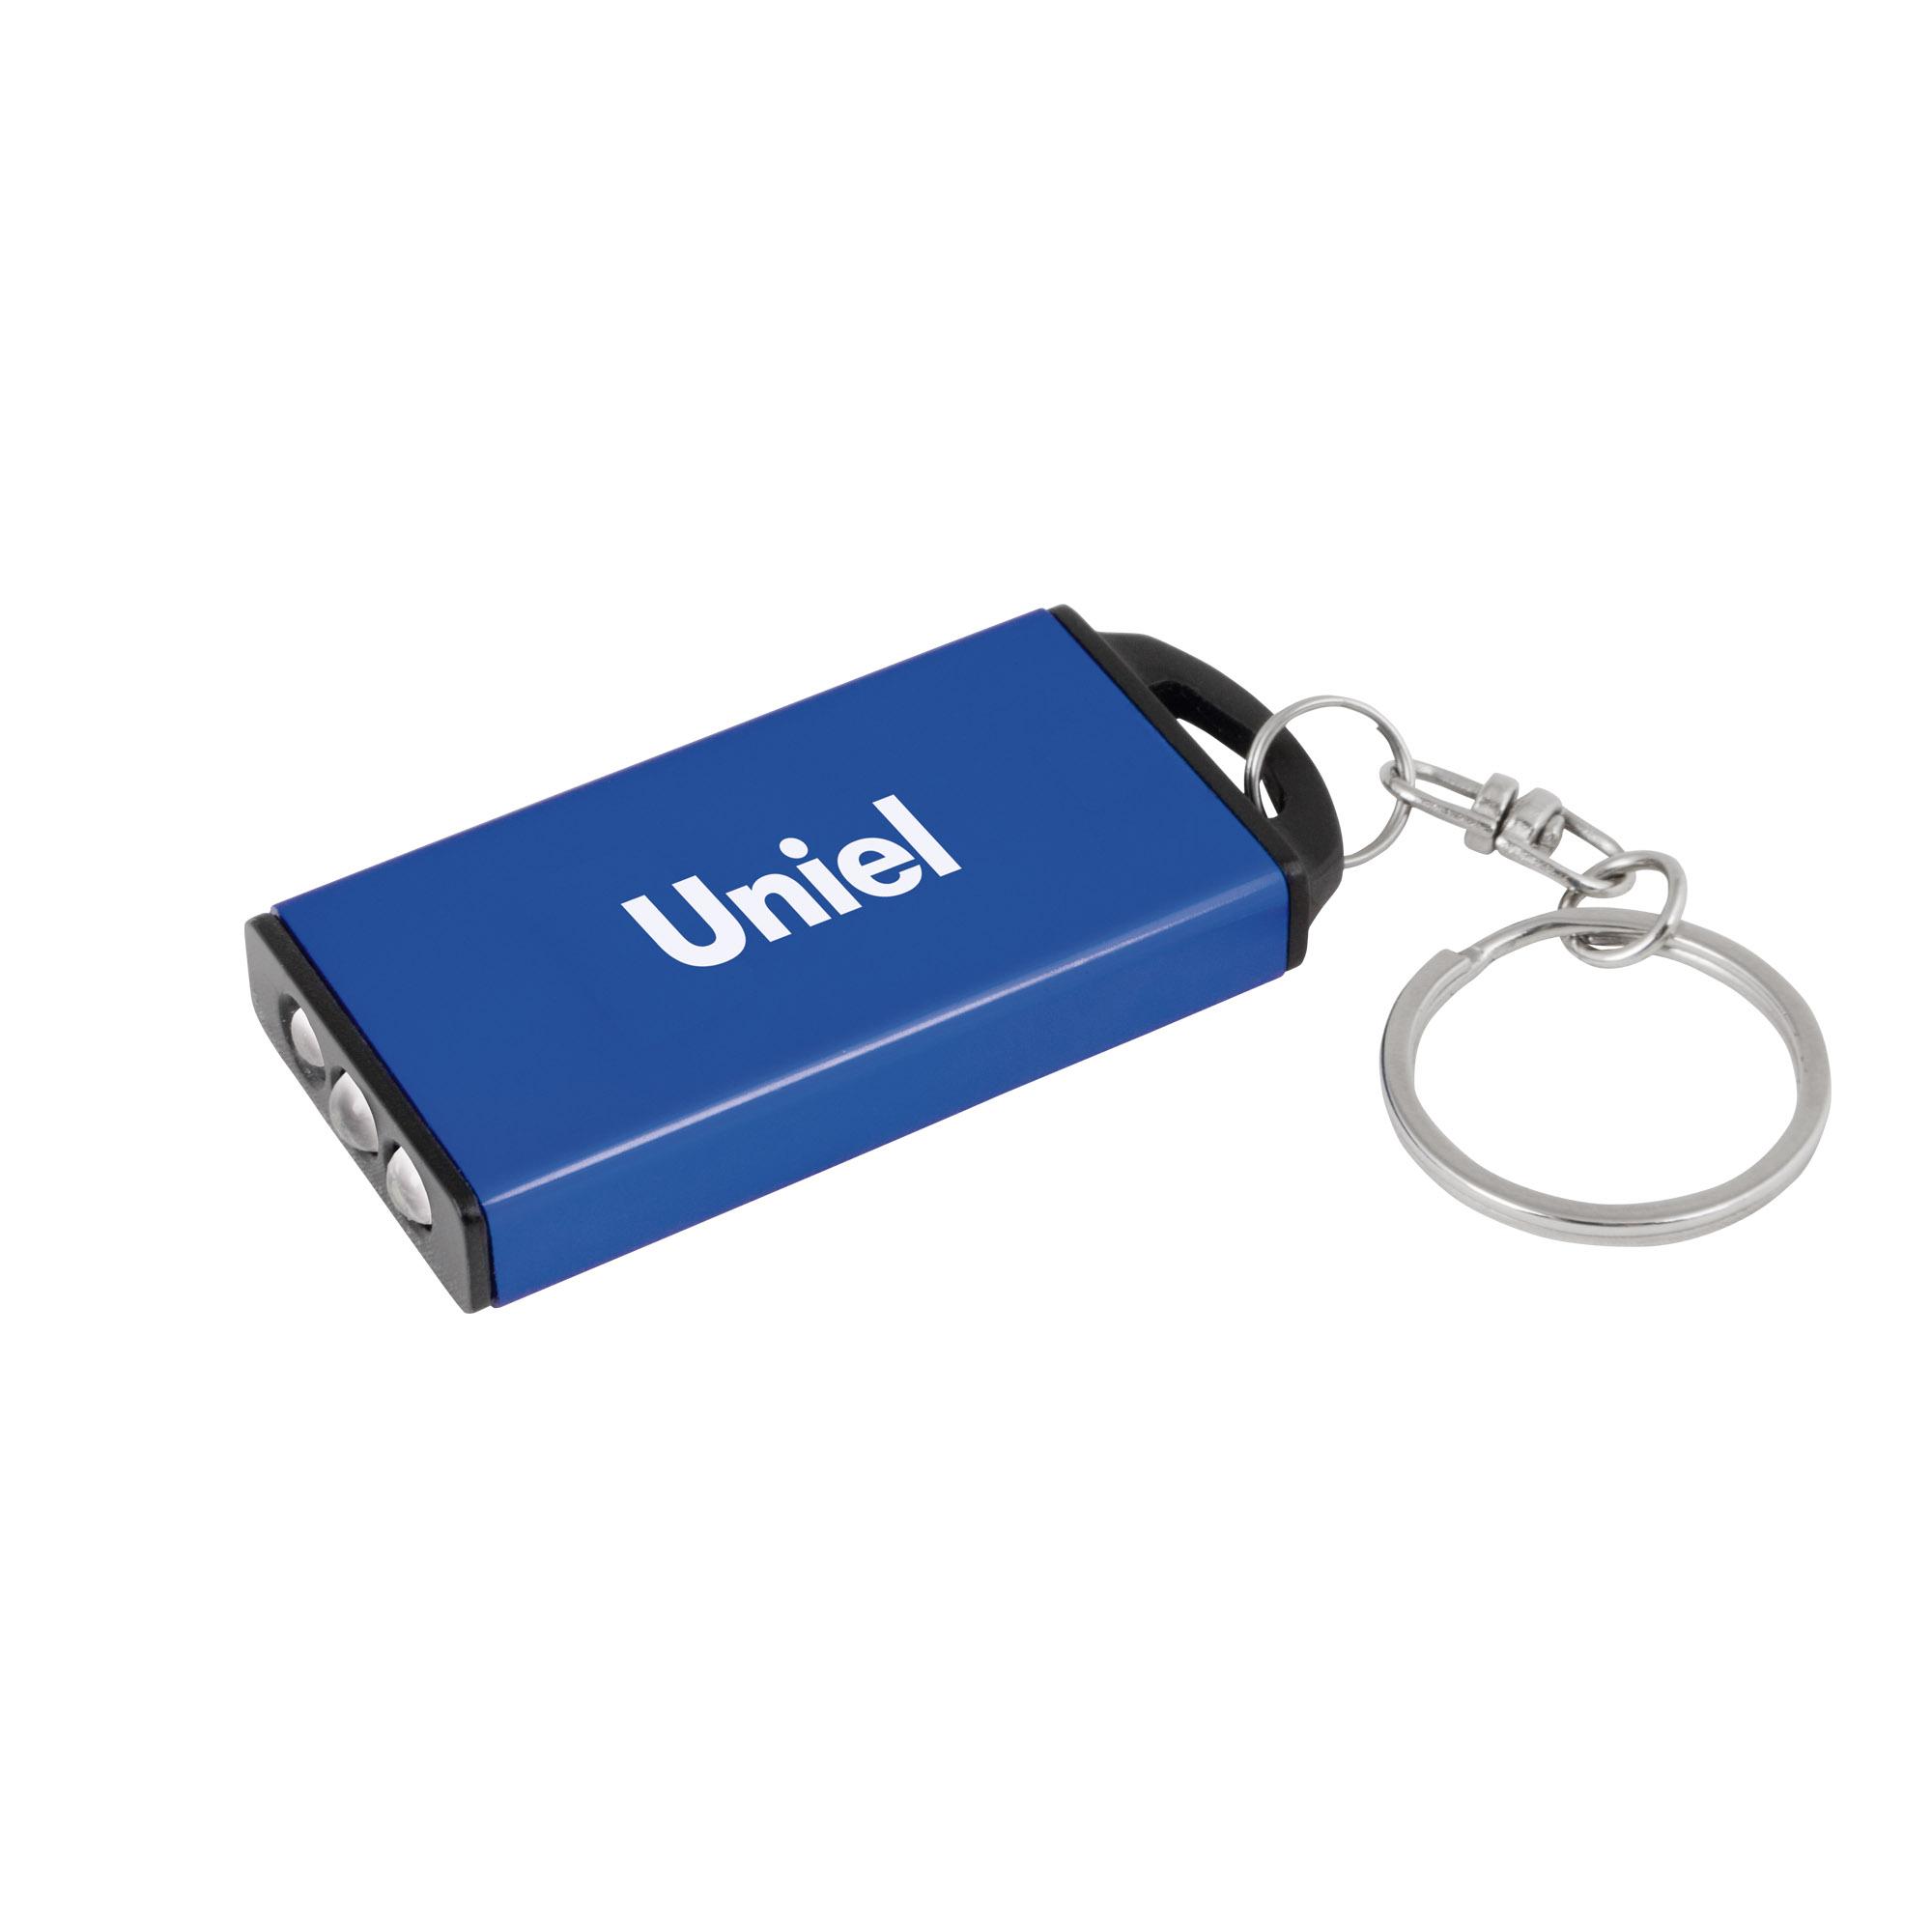 Фонарь Uniel S-kl017-c blue